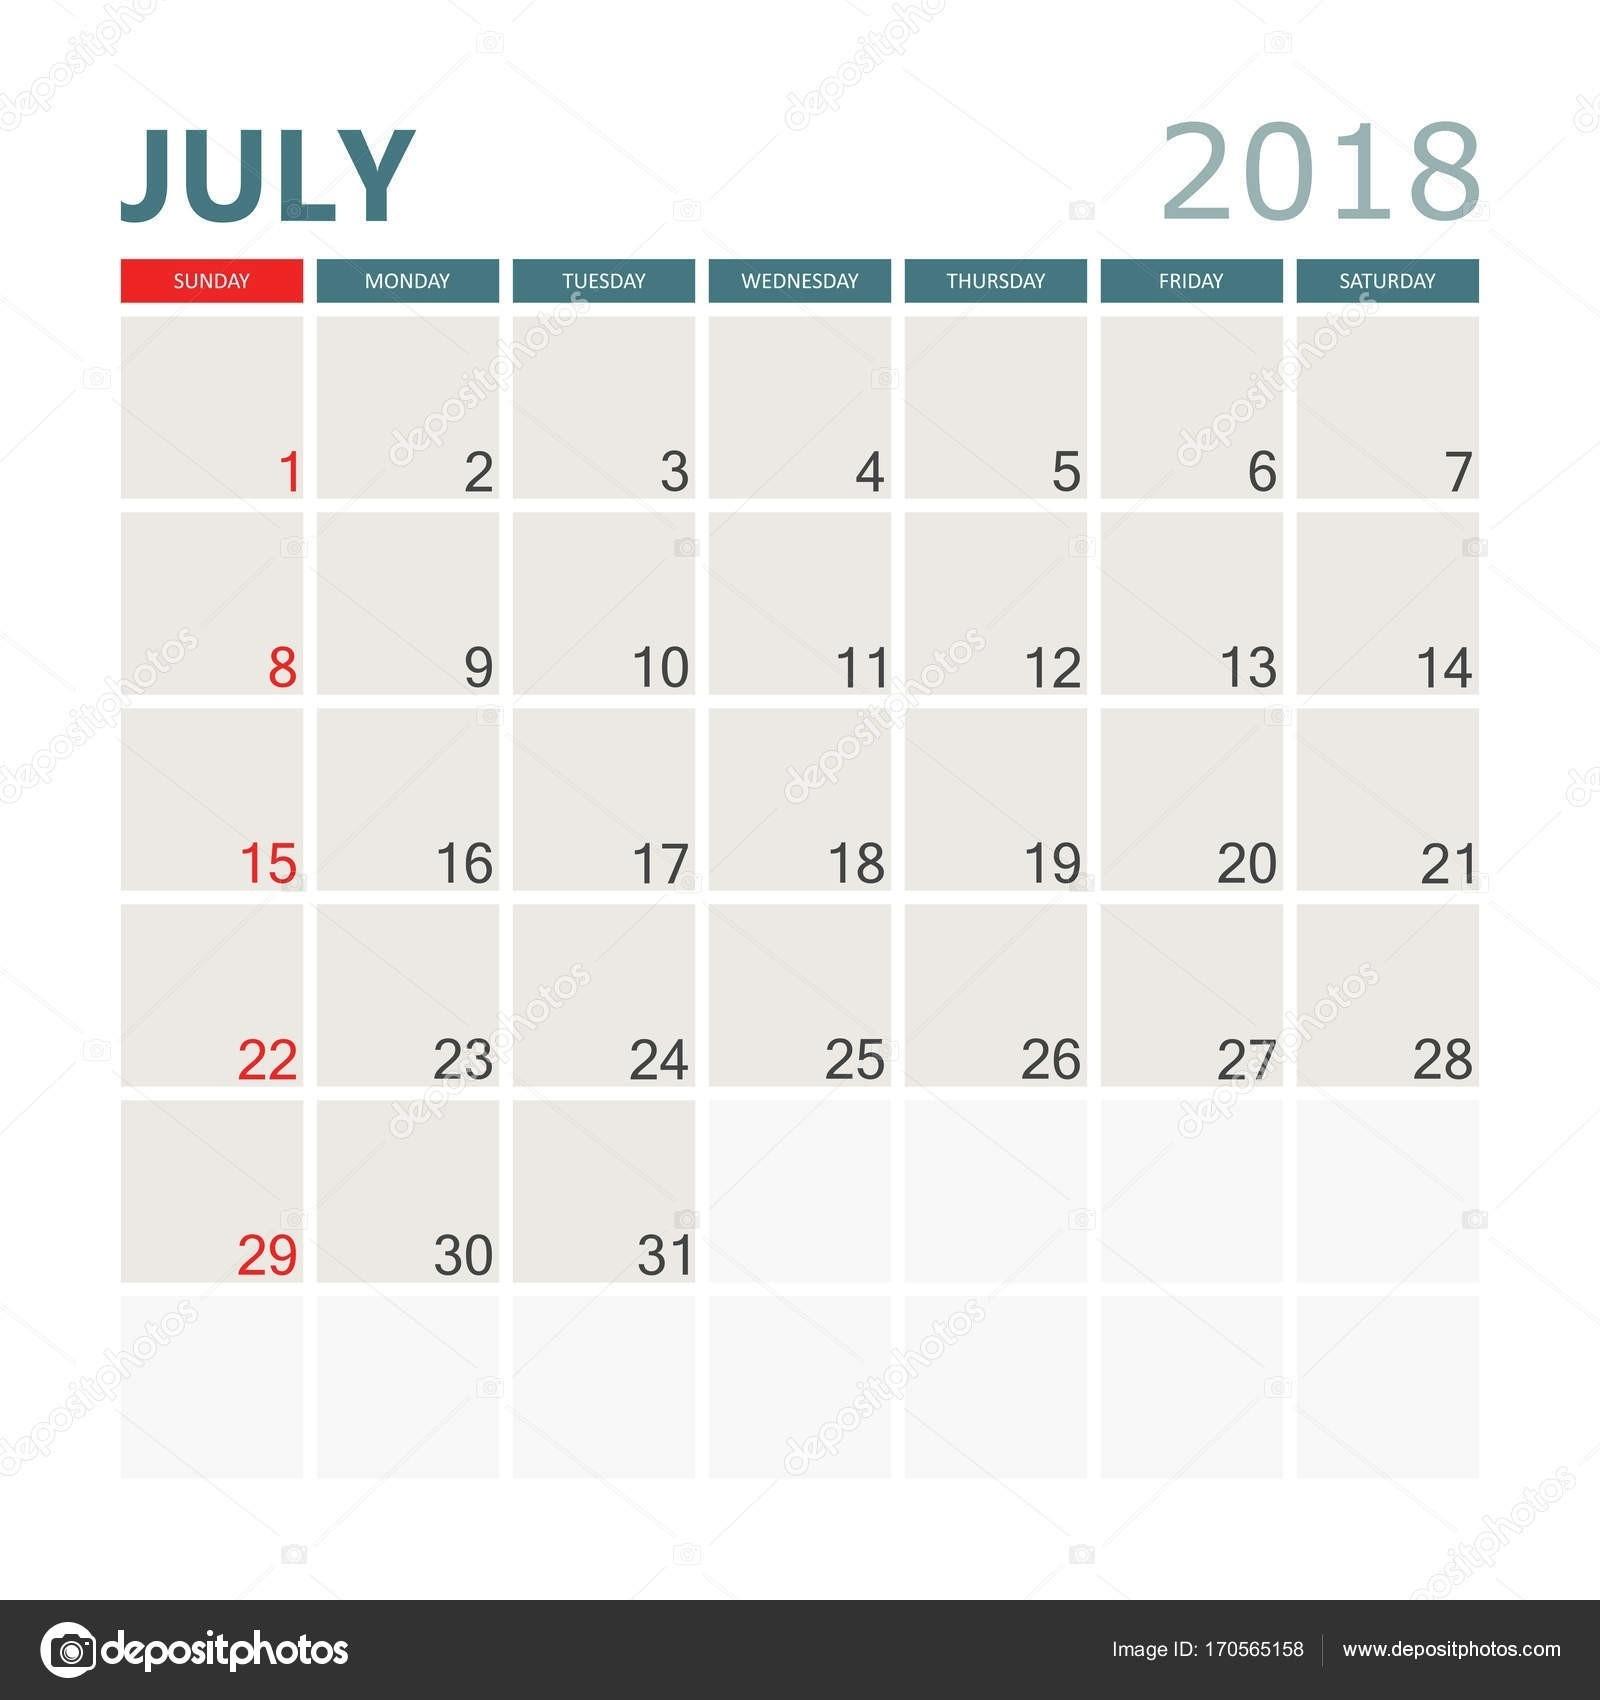 Depo Provera Calendar Printable Pdf | Calendar Printable Free